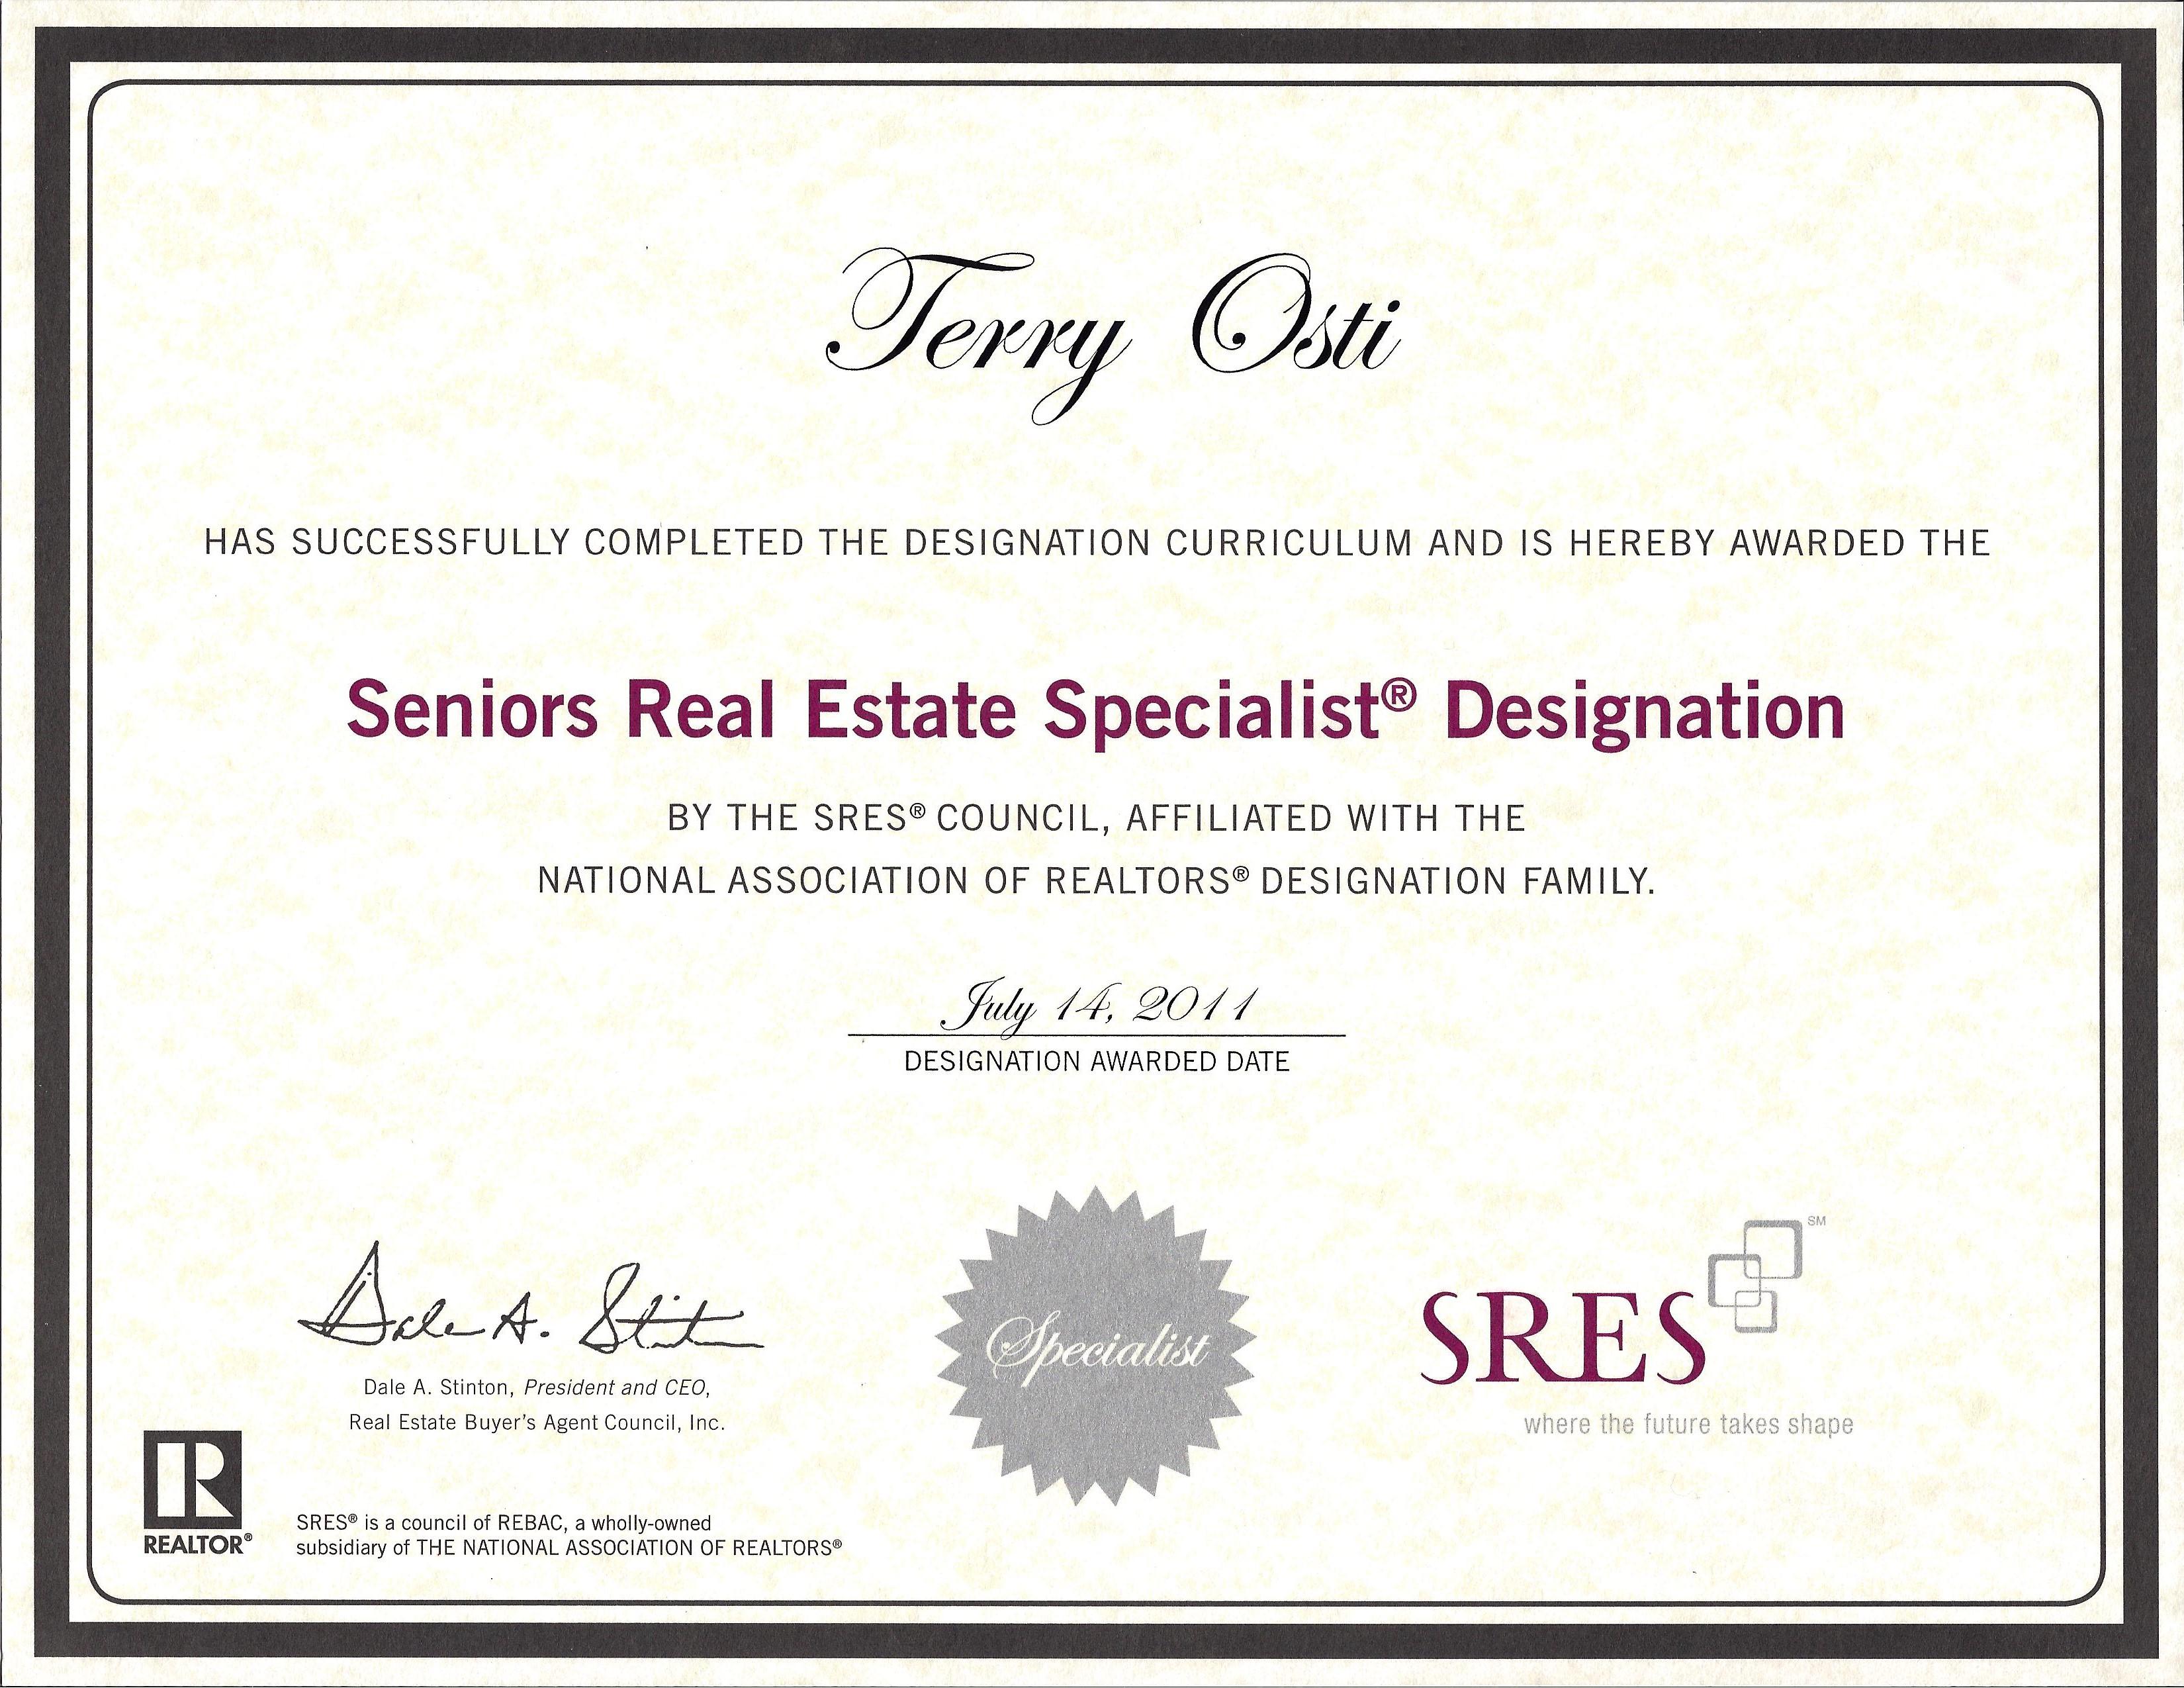 Seniors Real Estate Specialist  image